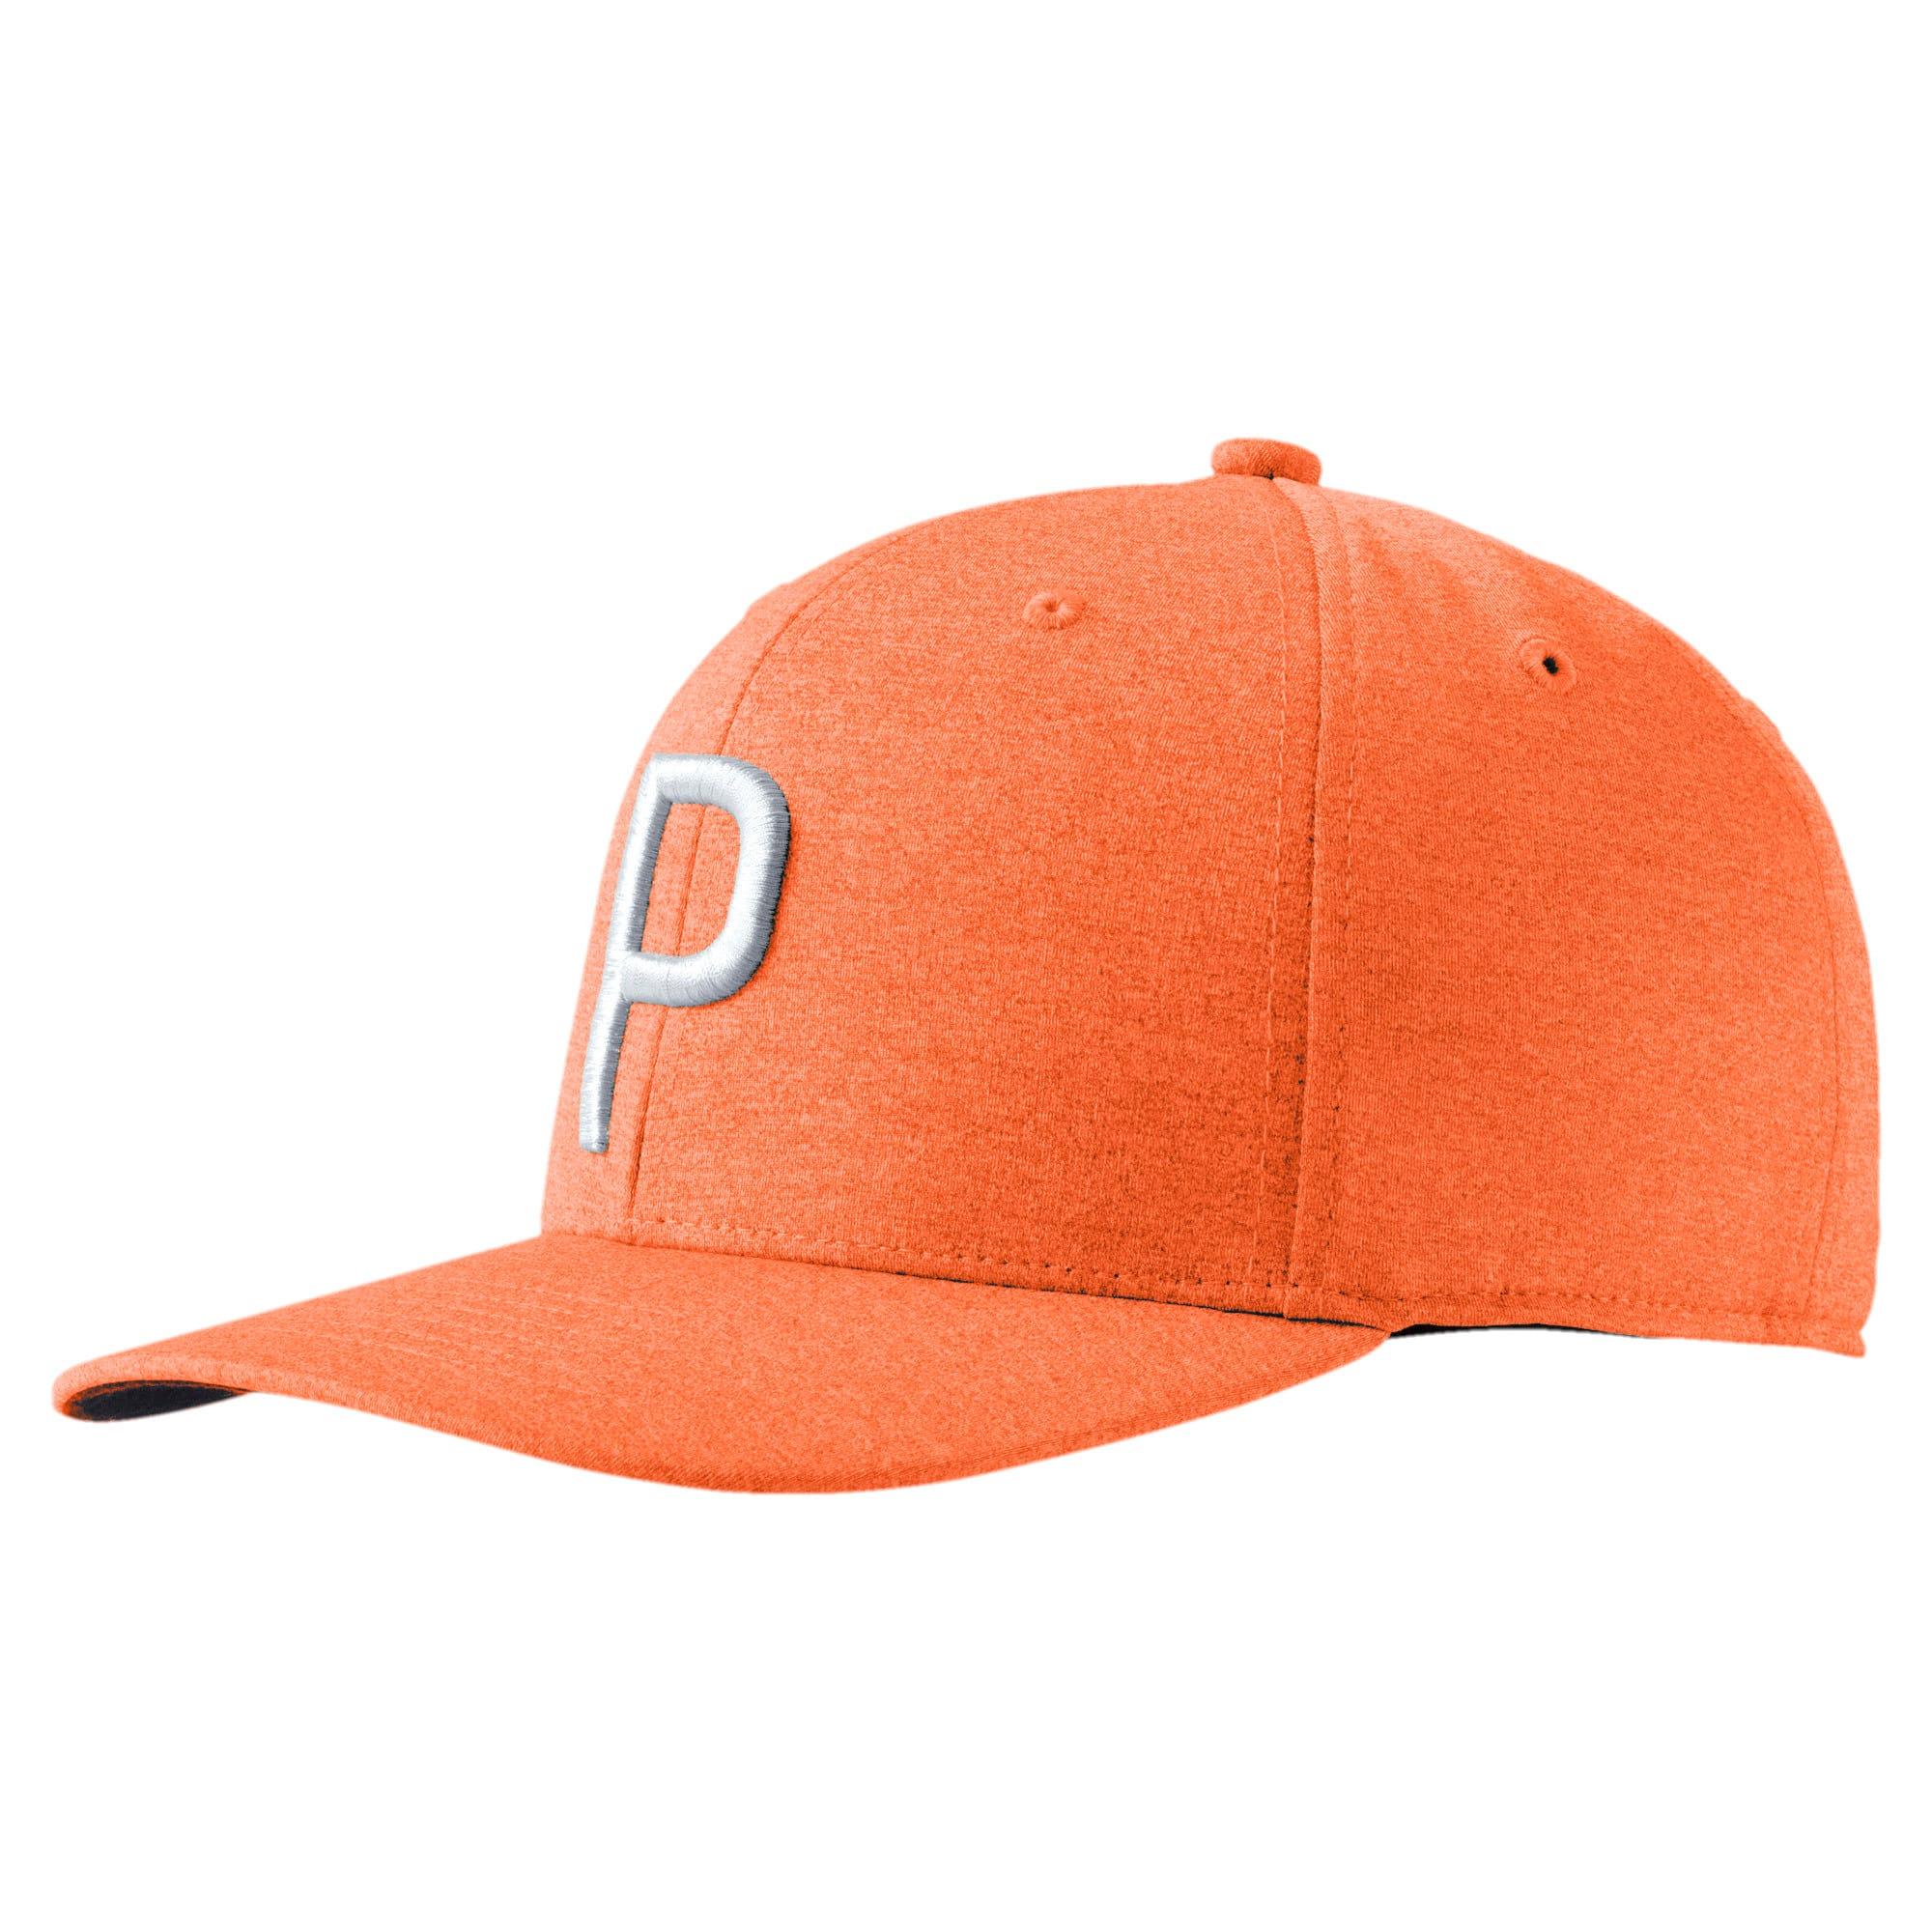 Thumbnail 1 of Golf Men's P Snapback Cap, Vibrant Orange, medium